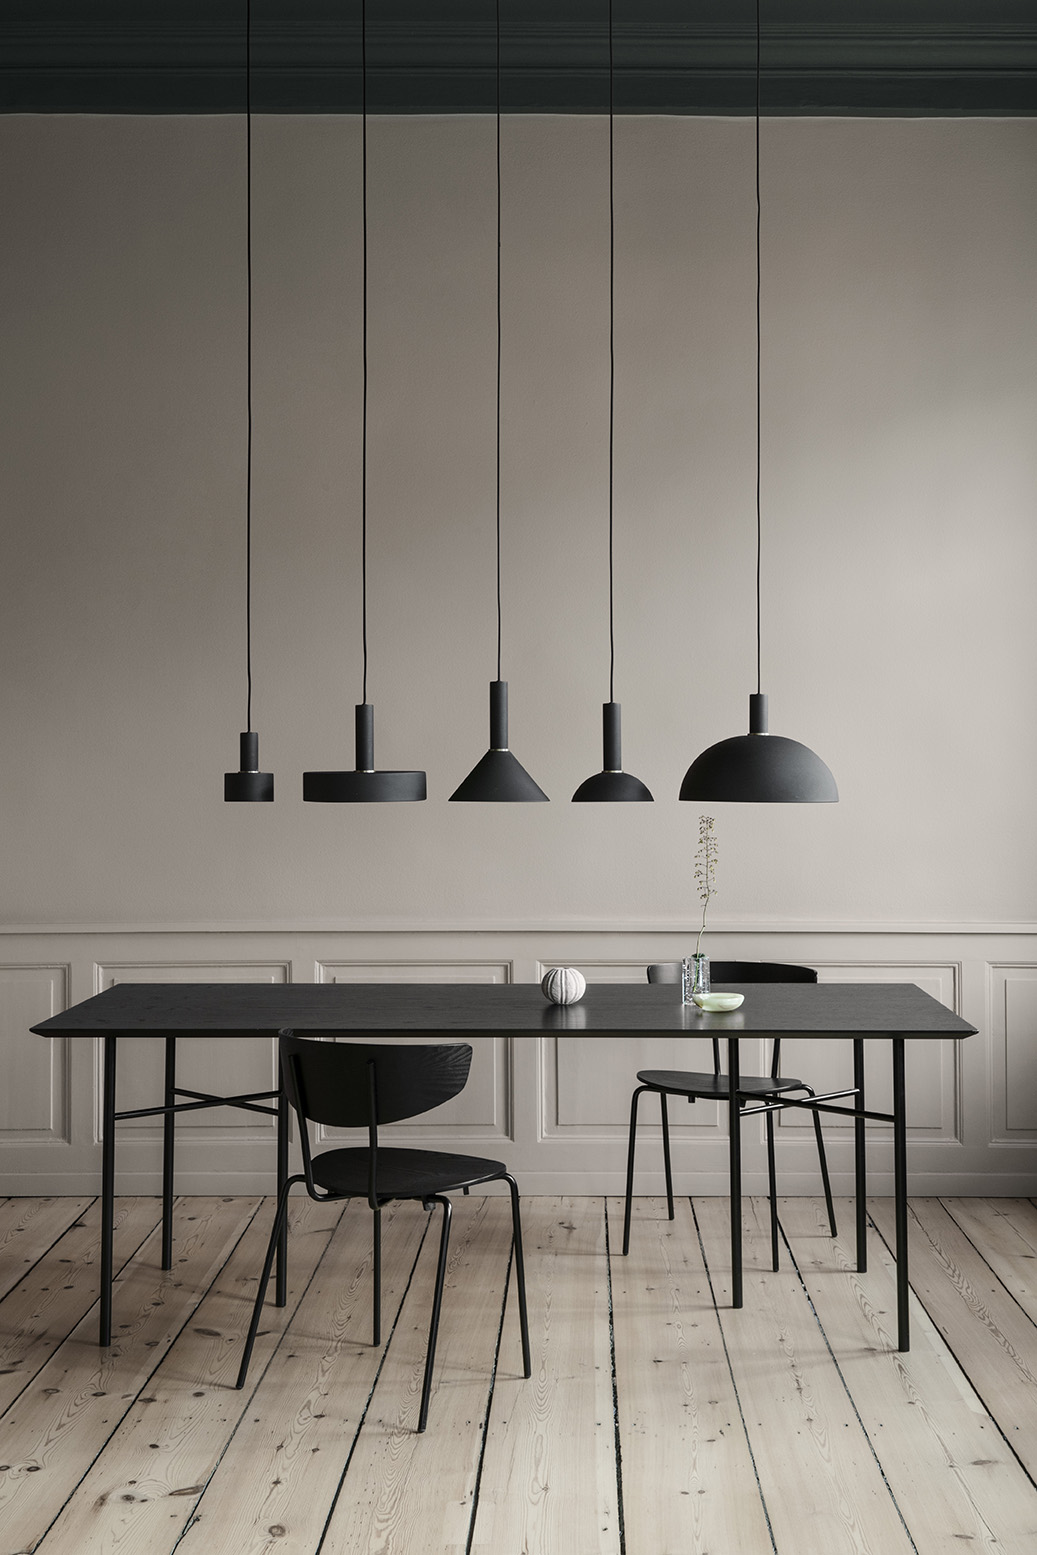 new ferm living collection coco lapine designcoco lapine. Black Bedroom Furniture Sets. Home Design Ideas